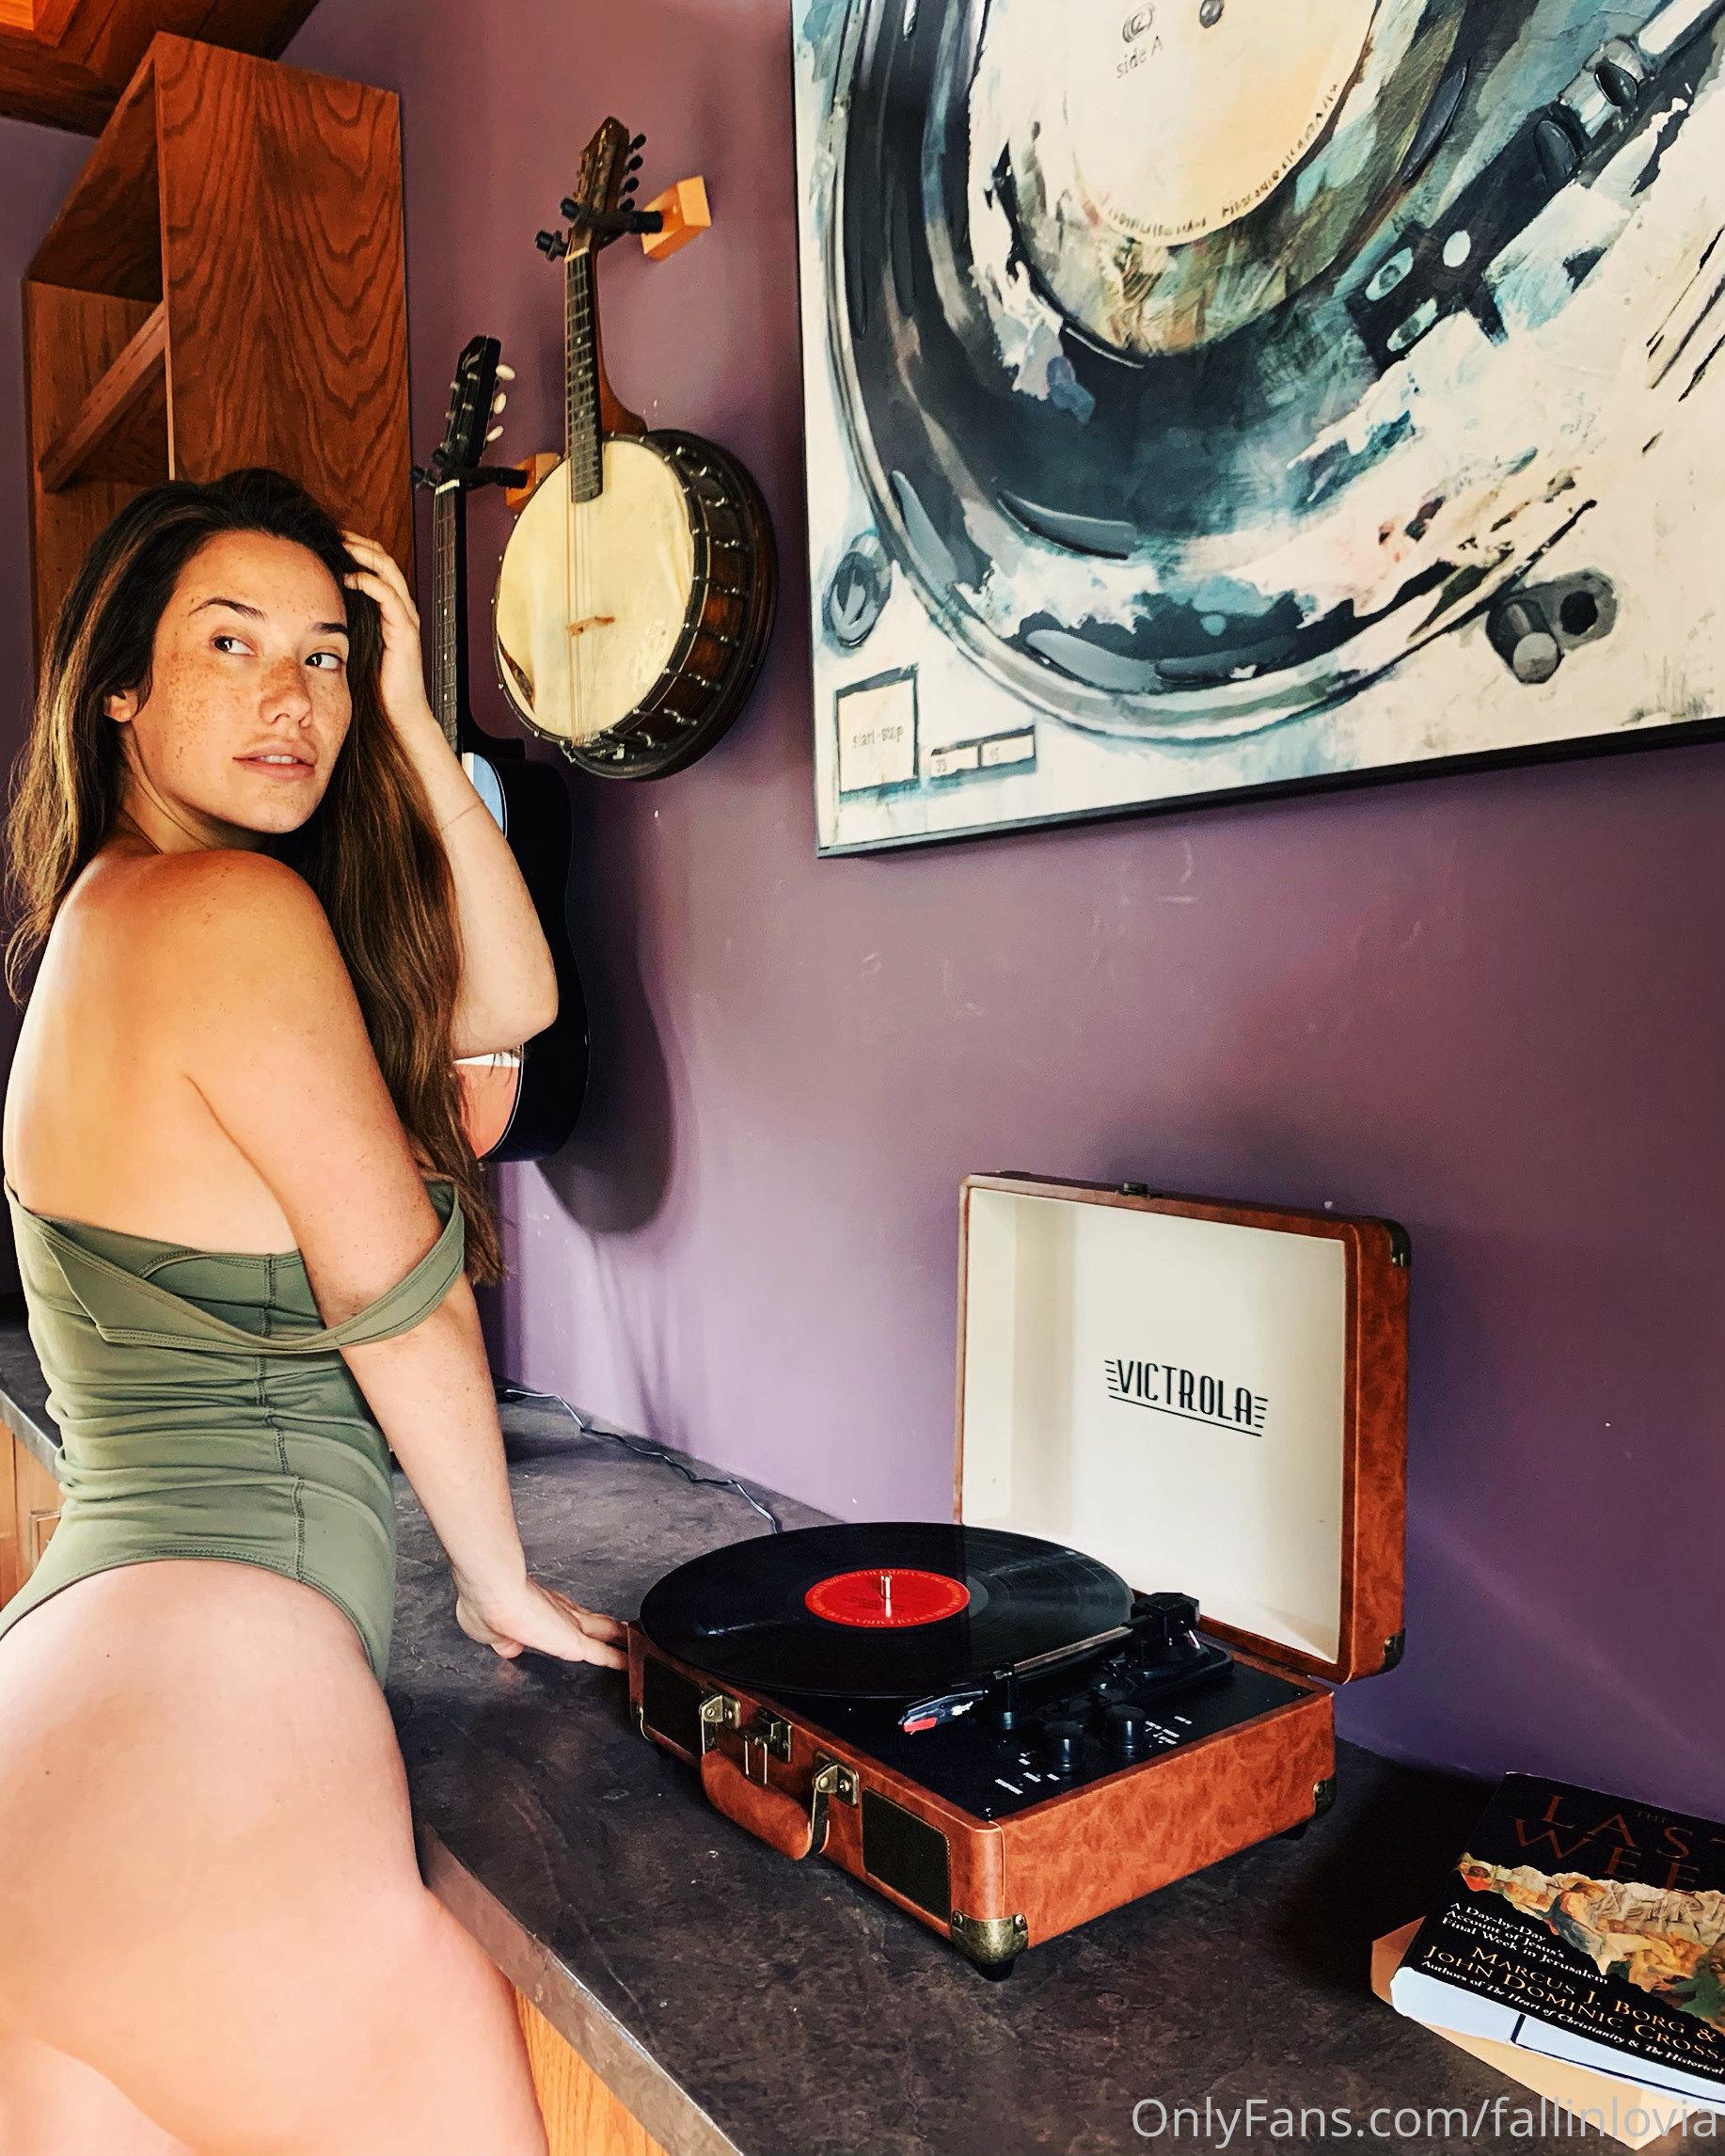 Eva Lovia, Fallinlovia, Onlyfans 0051